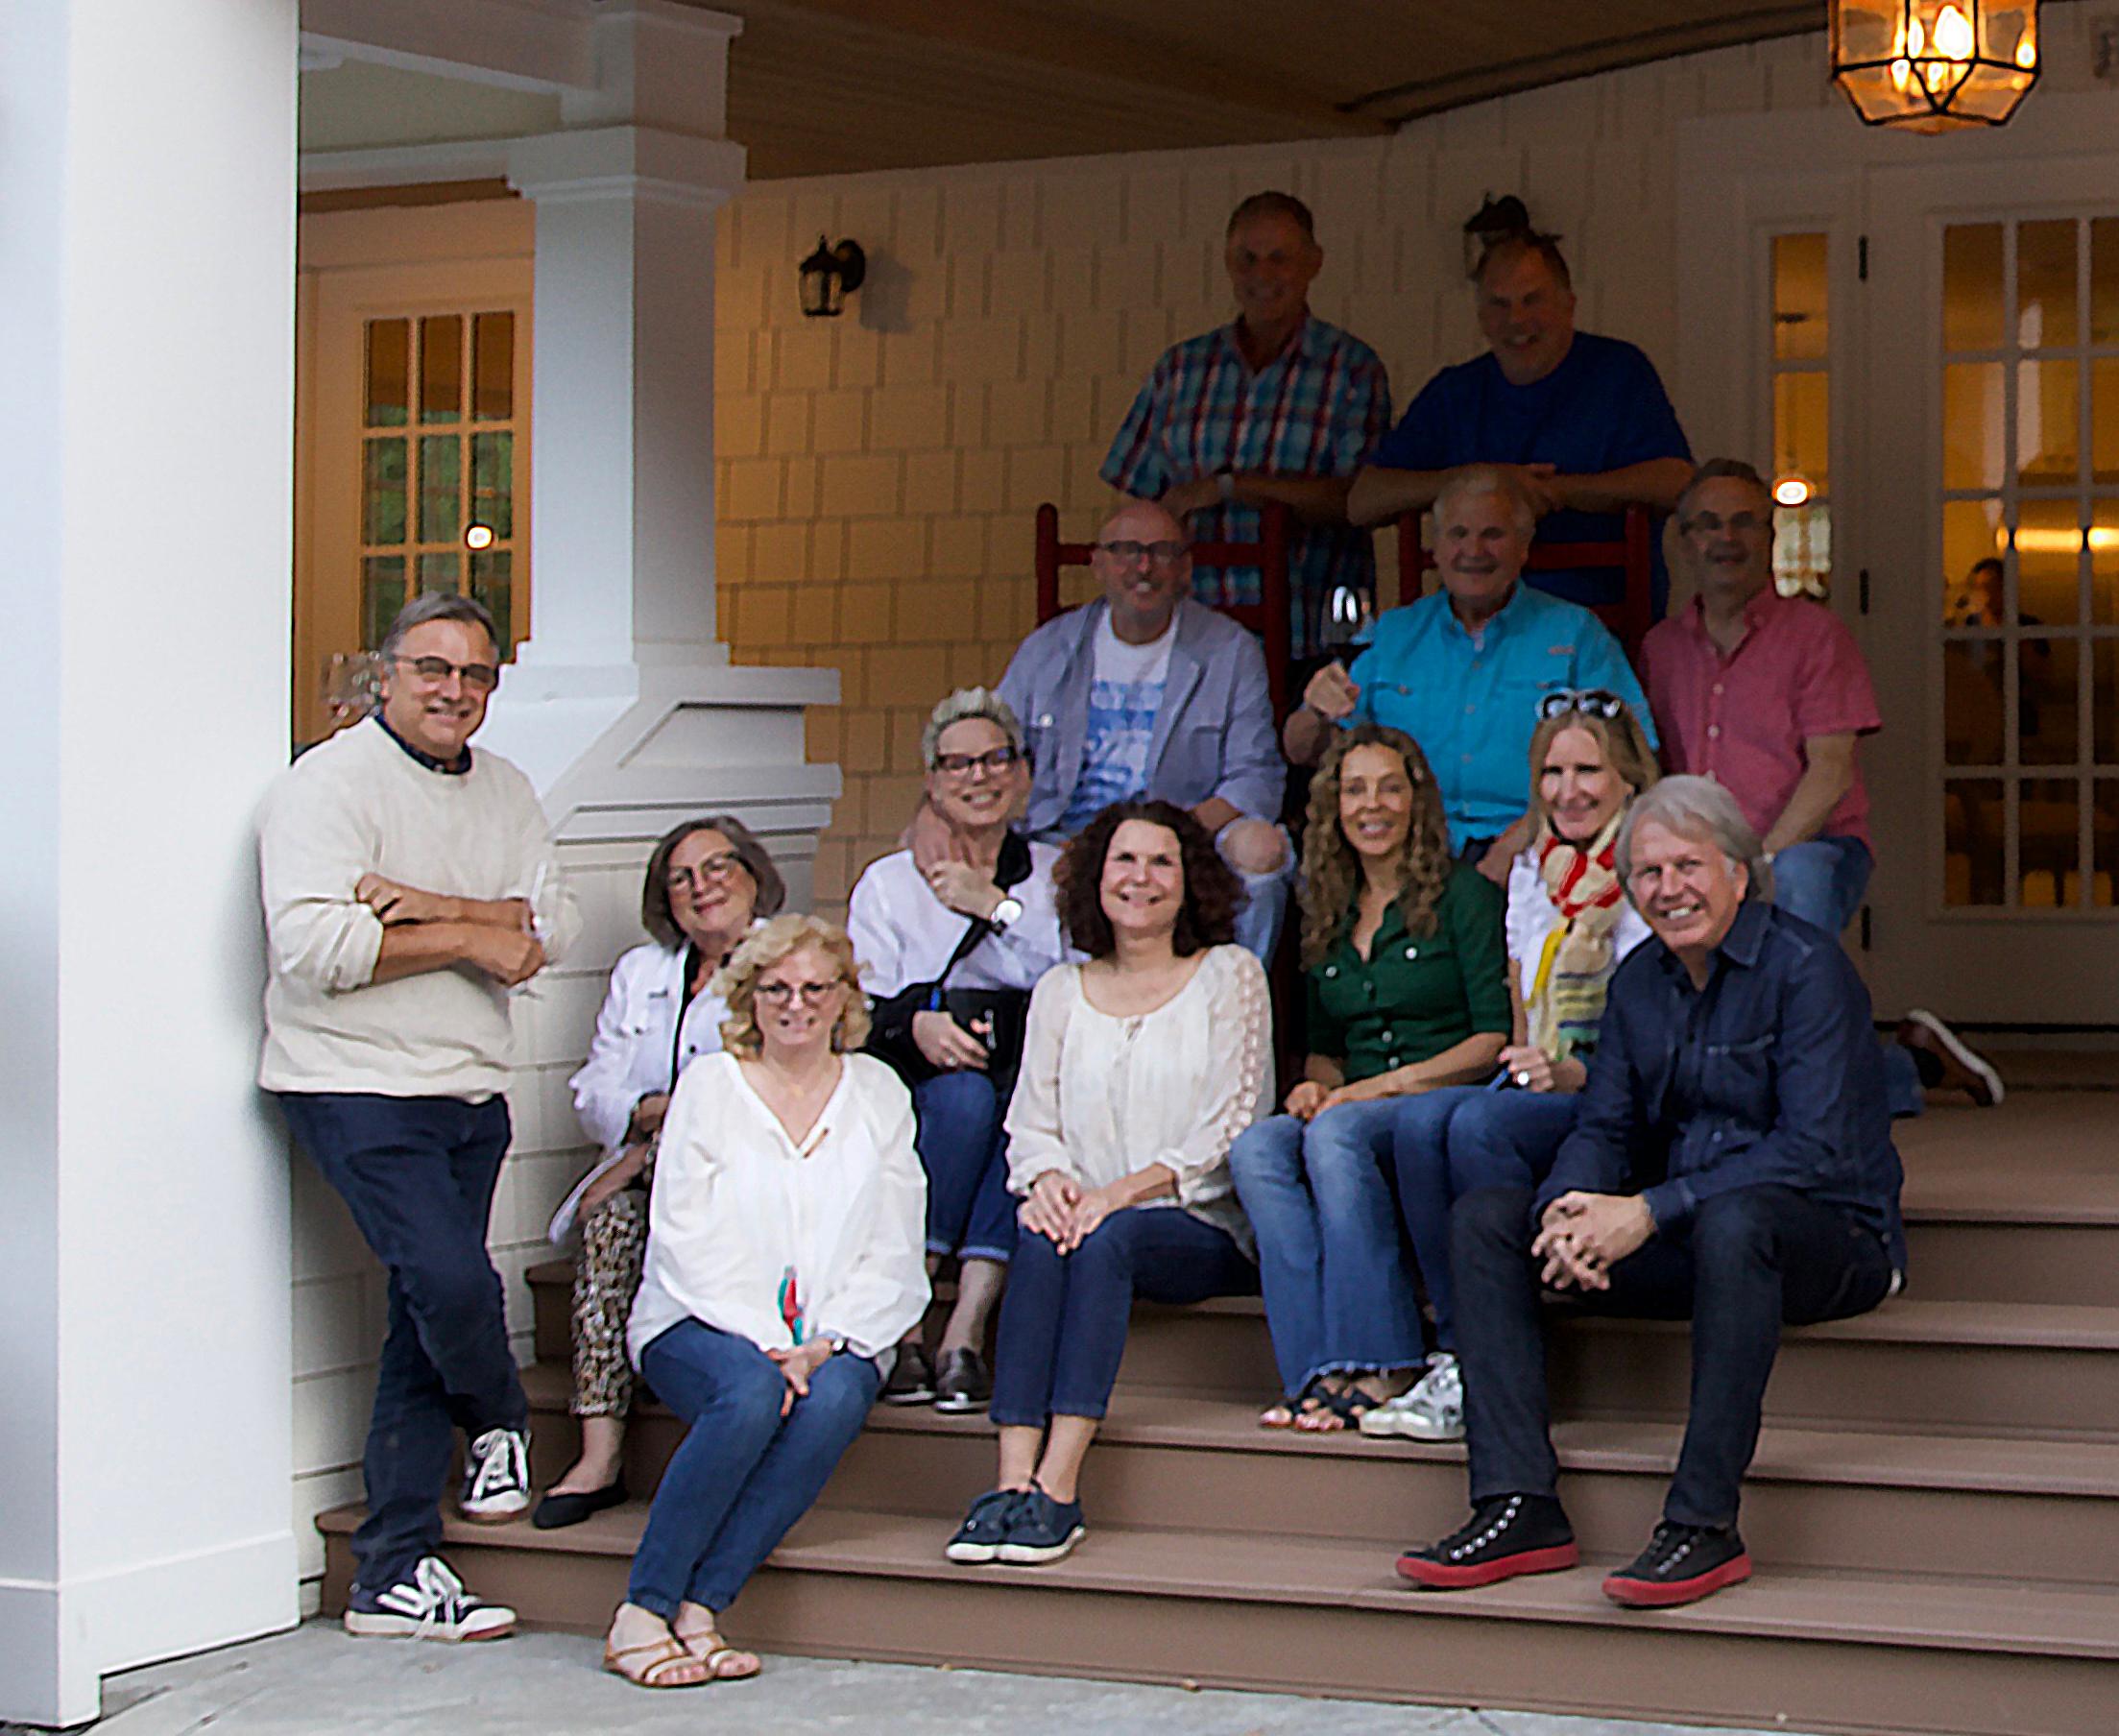 7 celebrity texas chefs at Karen Crouse's Farmouse